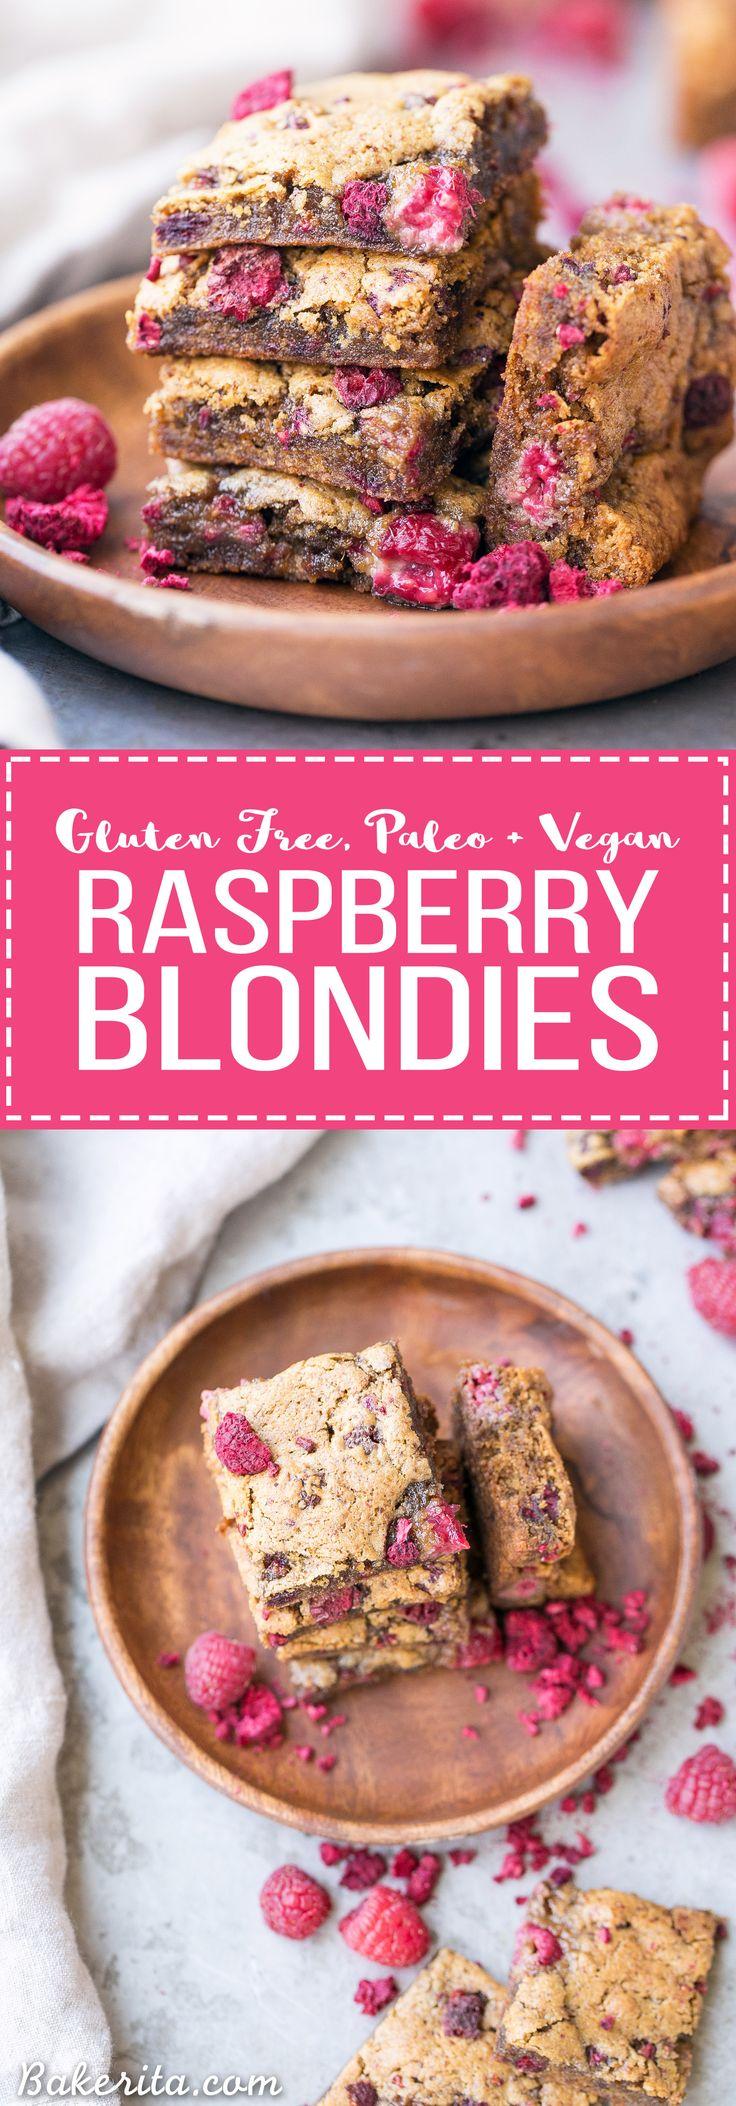 Raspberry Blondies